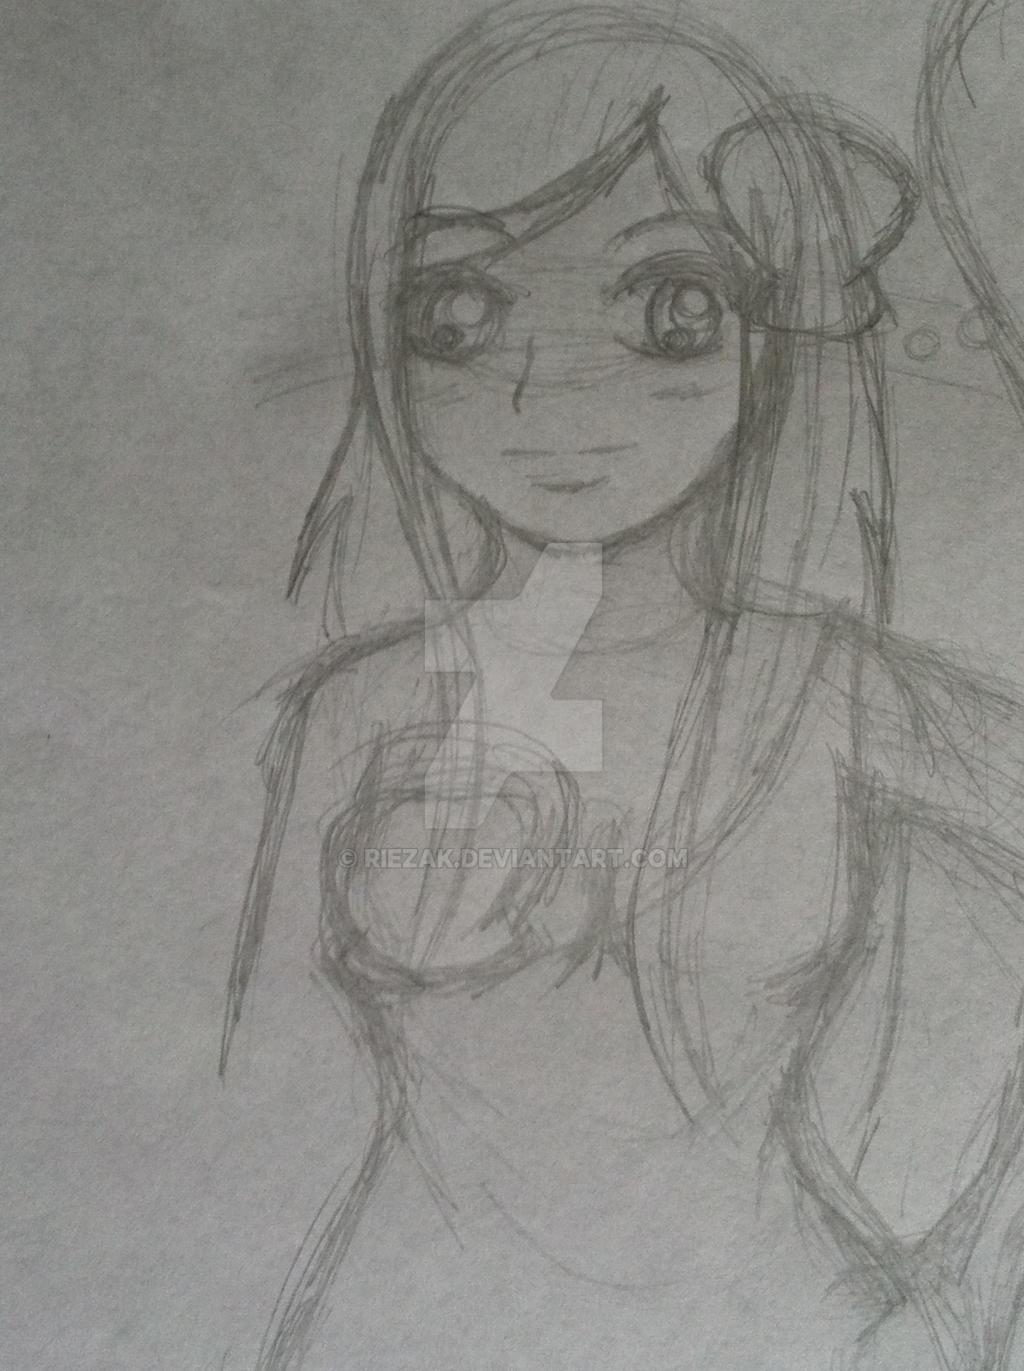 Chubby Mermaid Ayane by Riezak